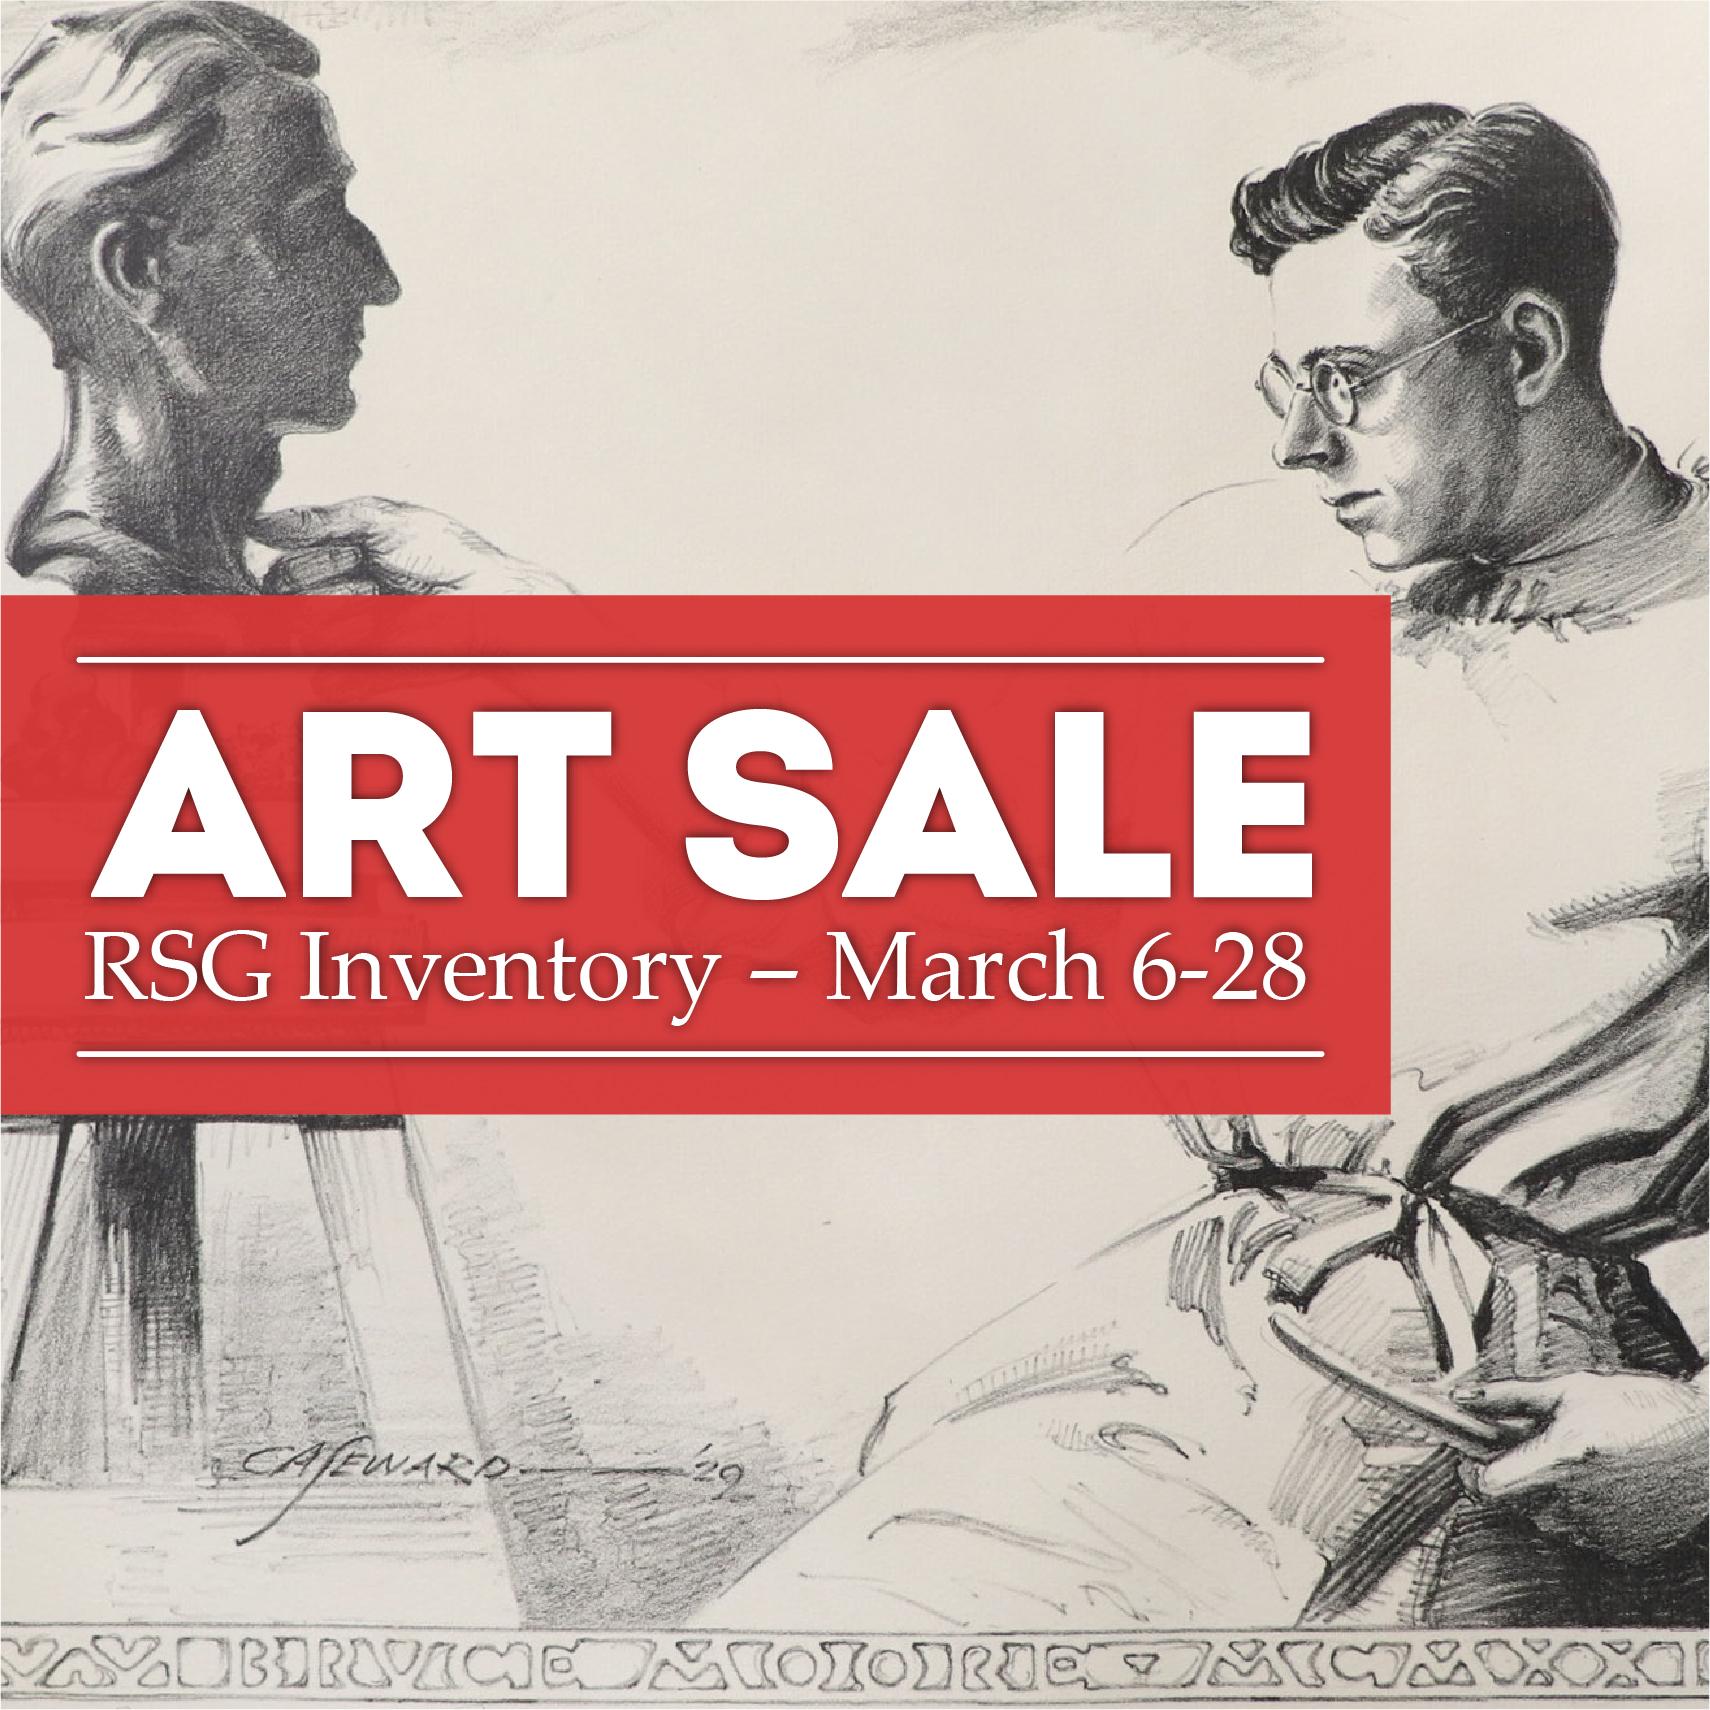 ART SALE : RSG Inventory